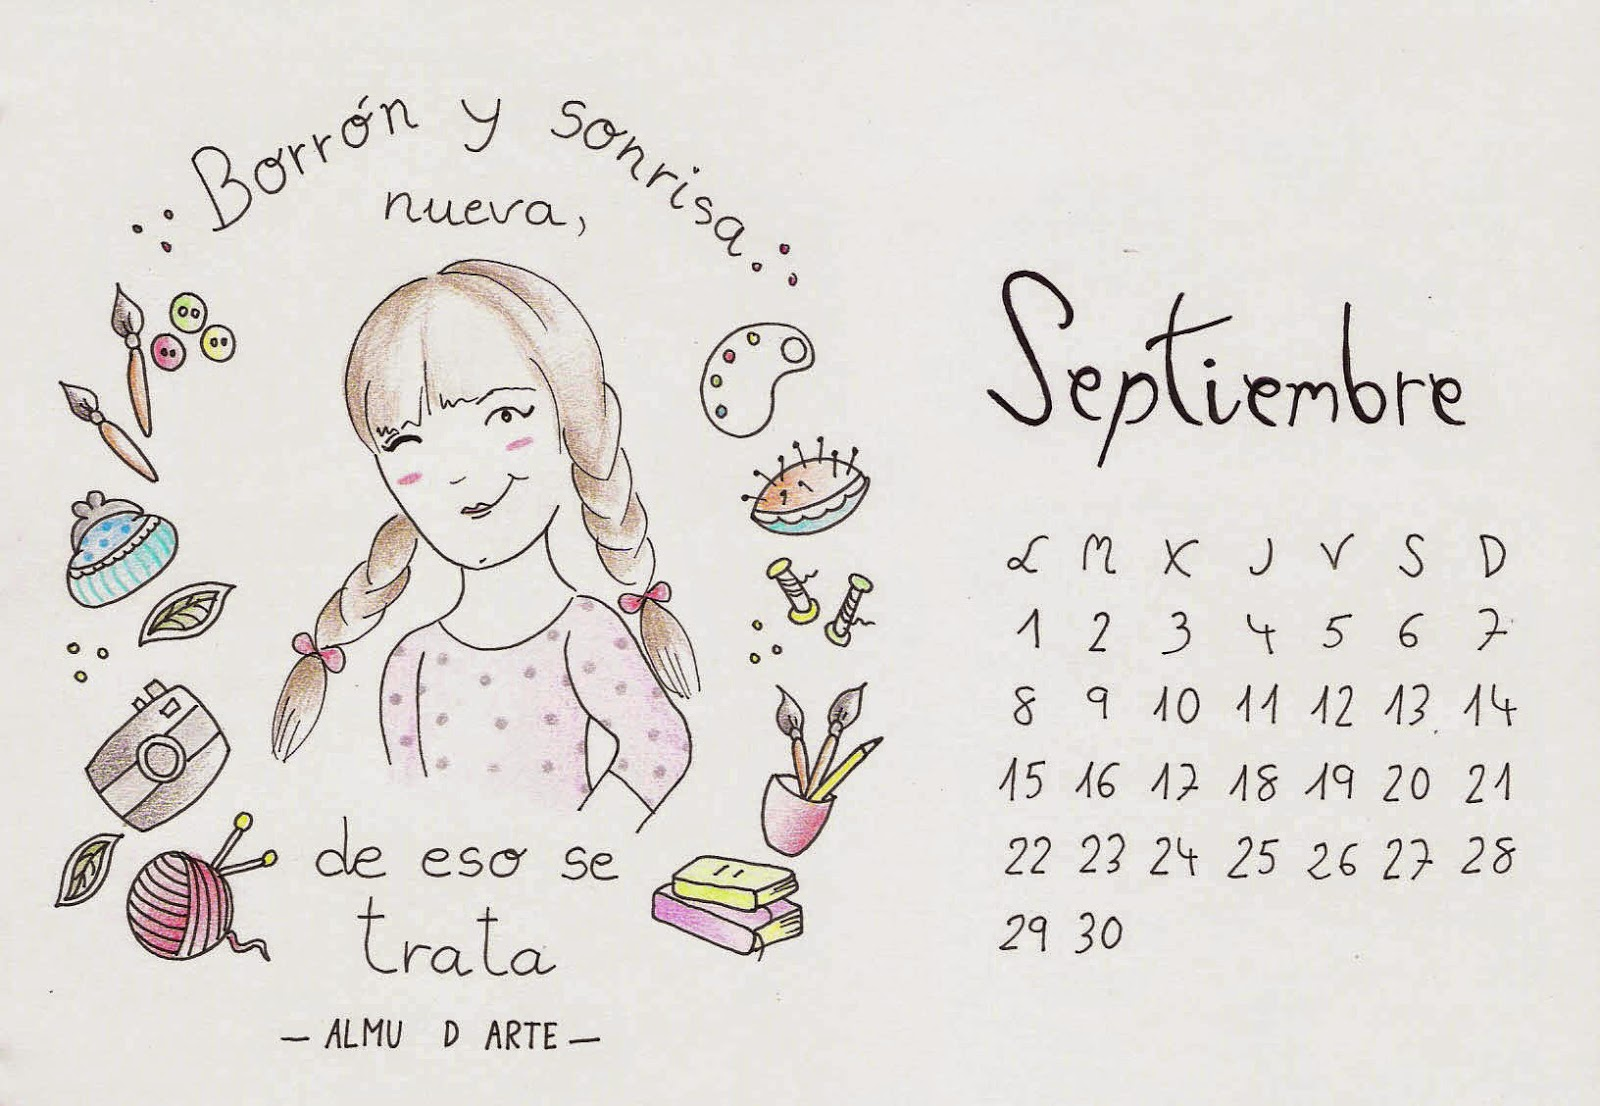 Calendario Almu d Arte